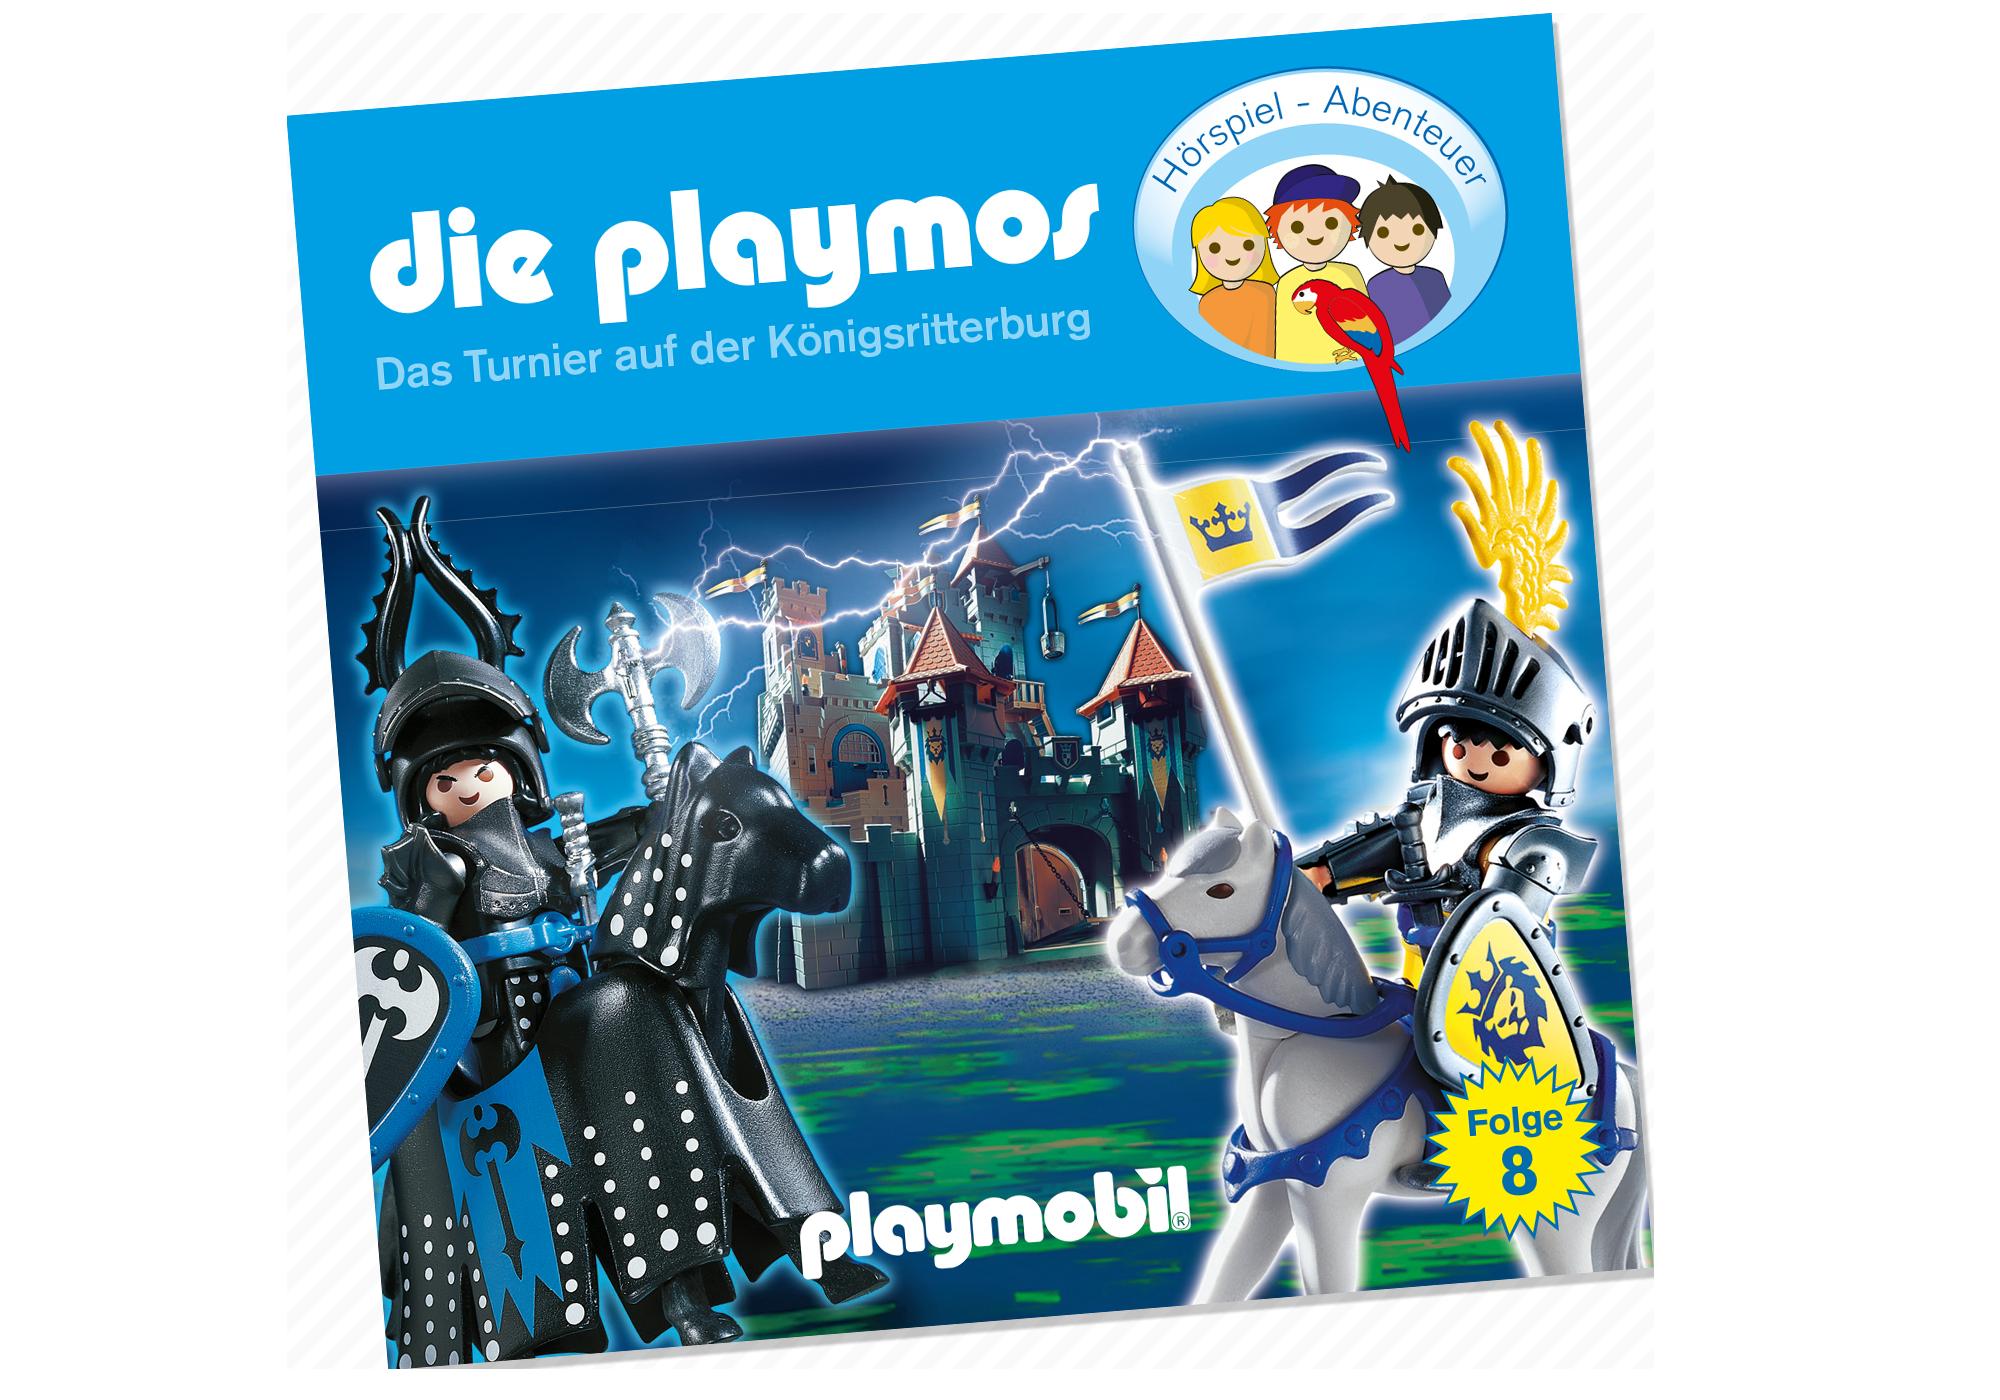 http://media.playmobil.com/i/playmobil/80163_product_detail